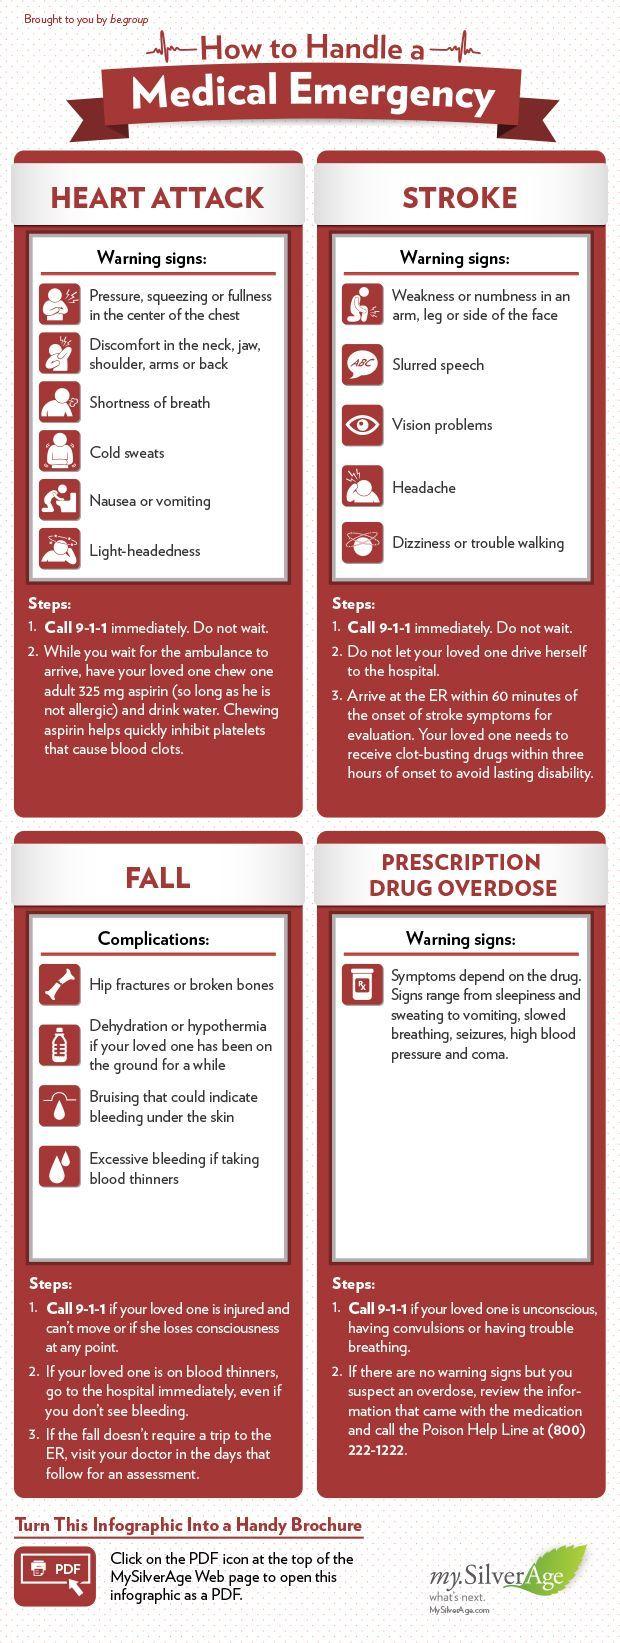 Infographic Showing Steps for Handling Medical Emergencies